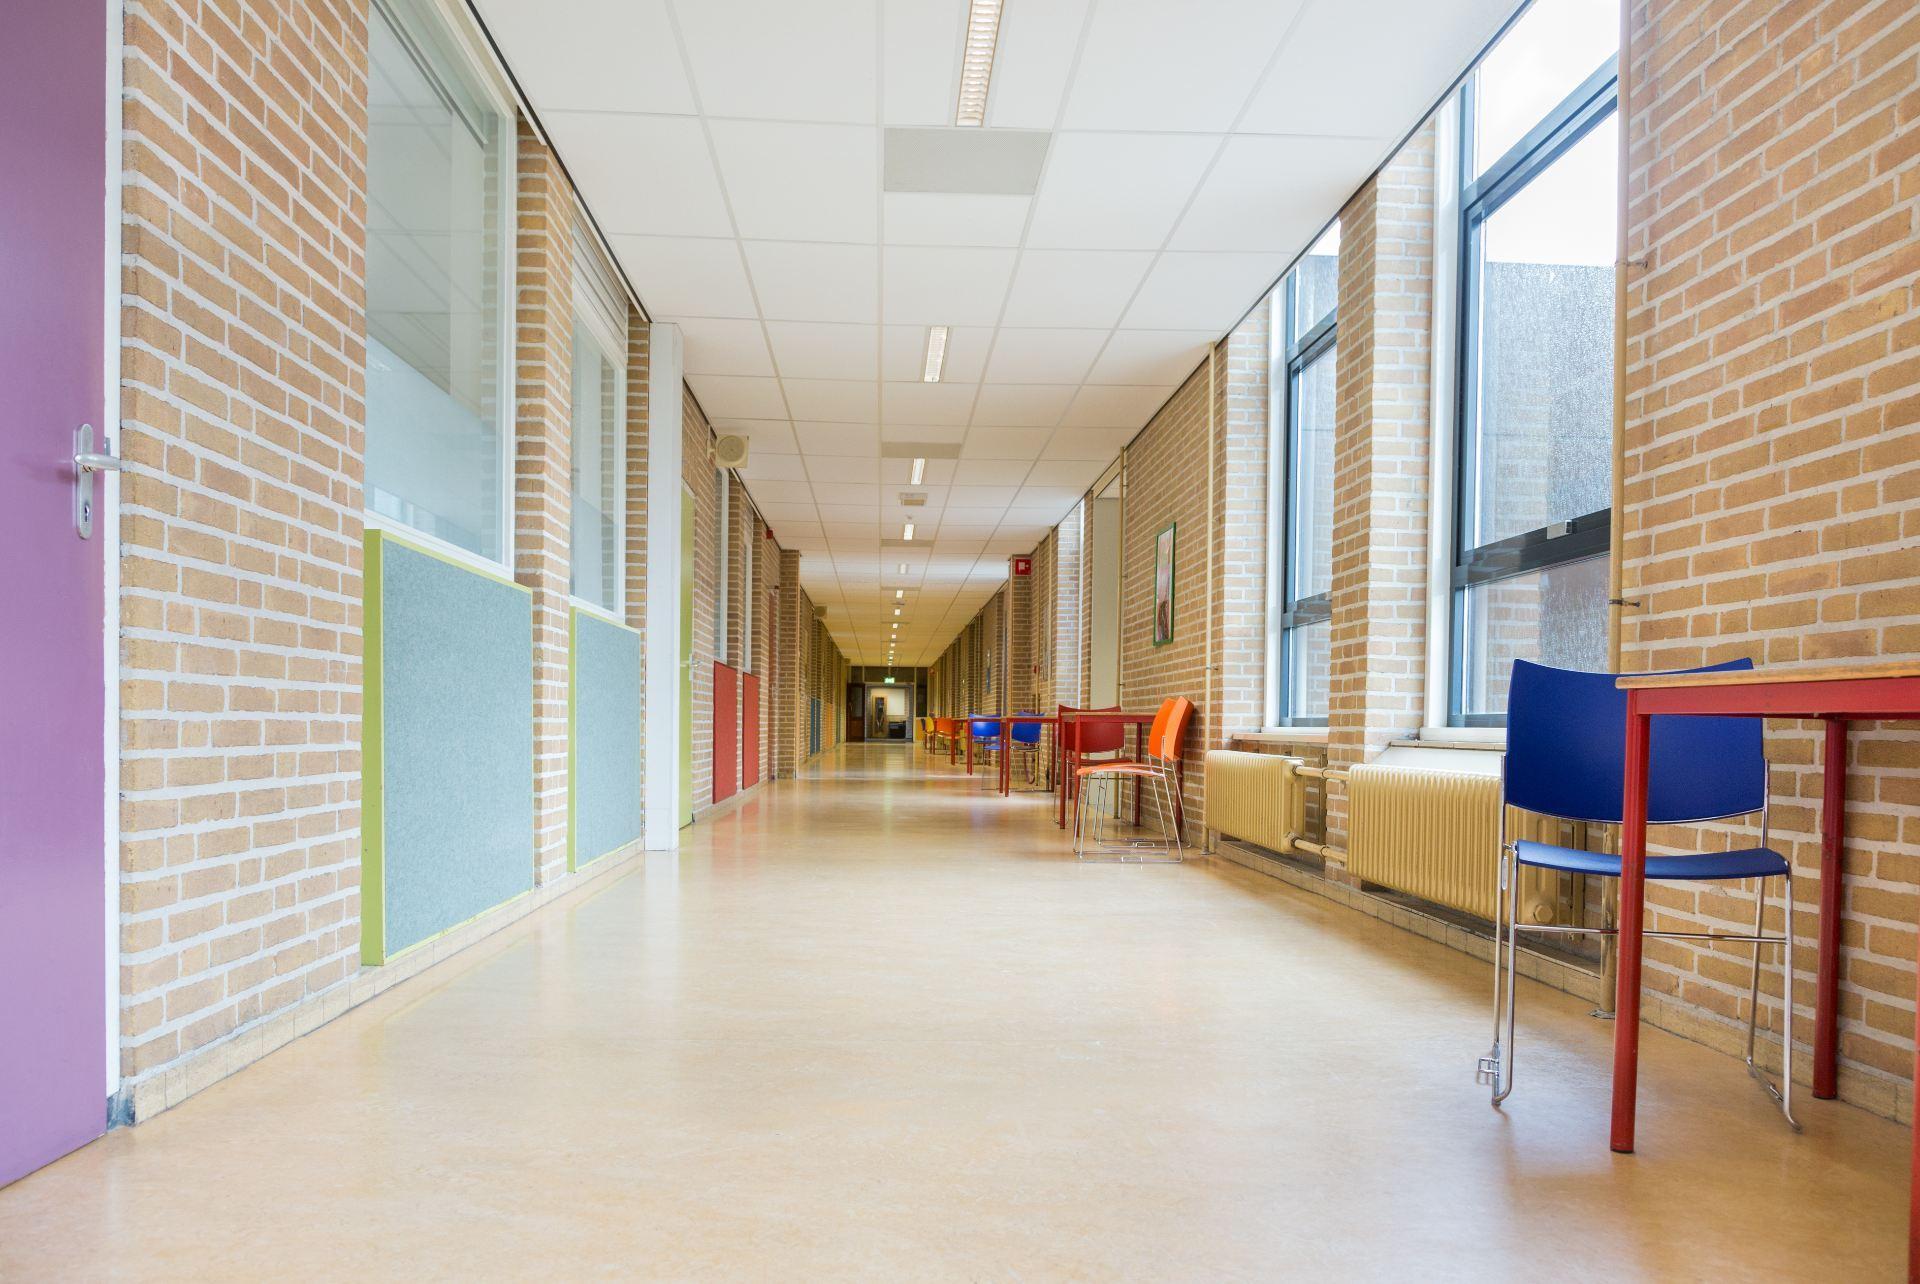 Image of school hallway